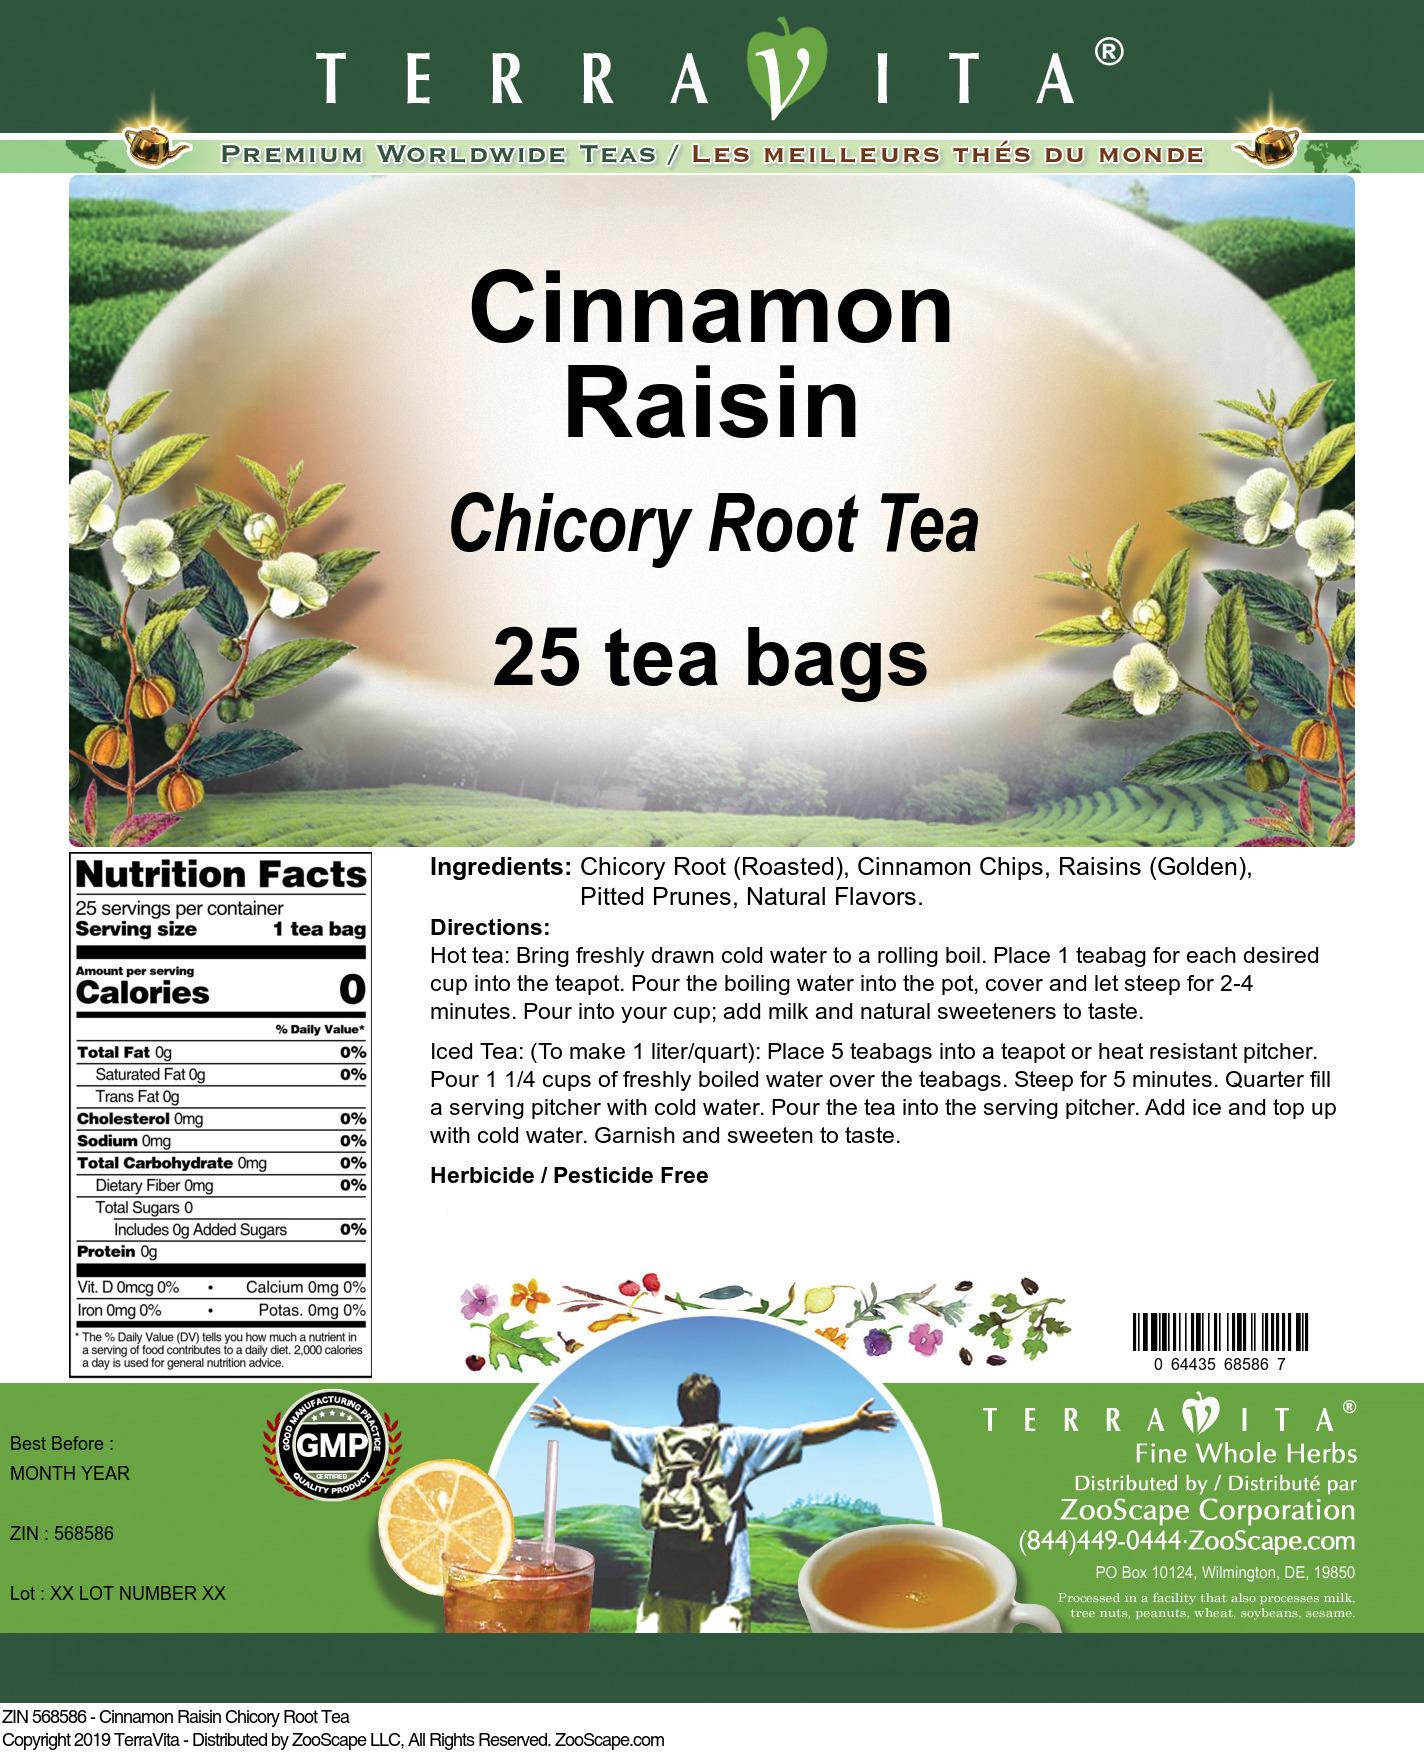 Cinnamon Raisin Chicory Root Tea